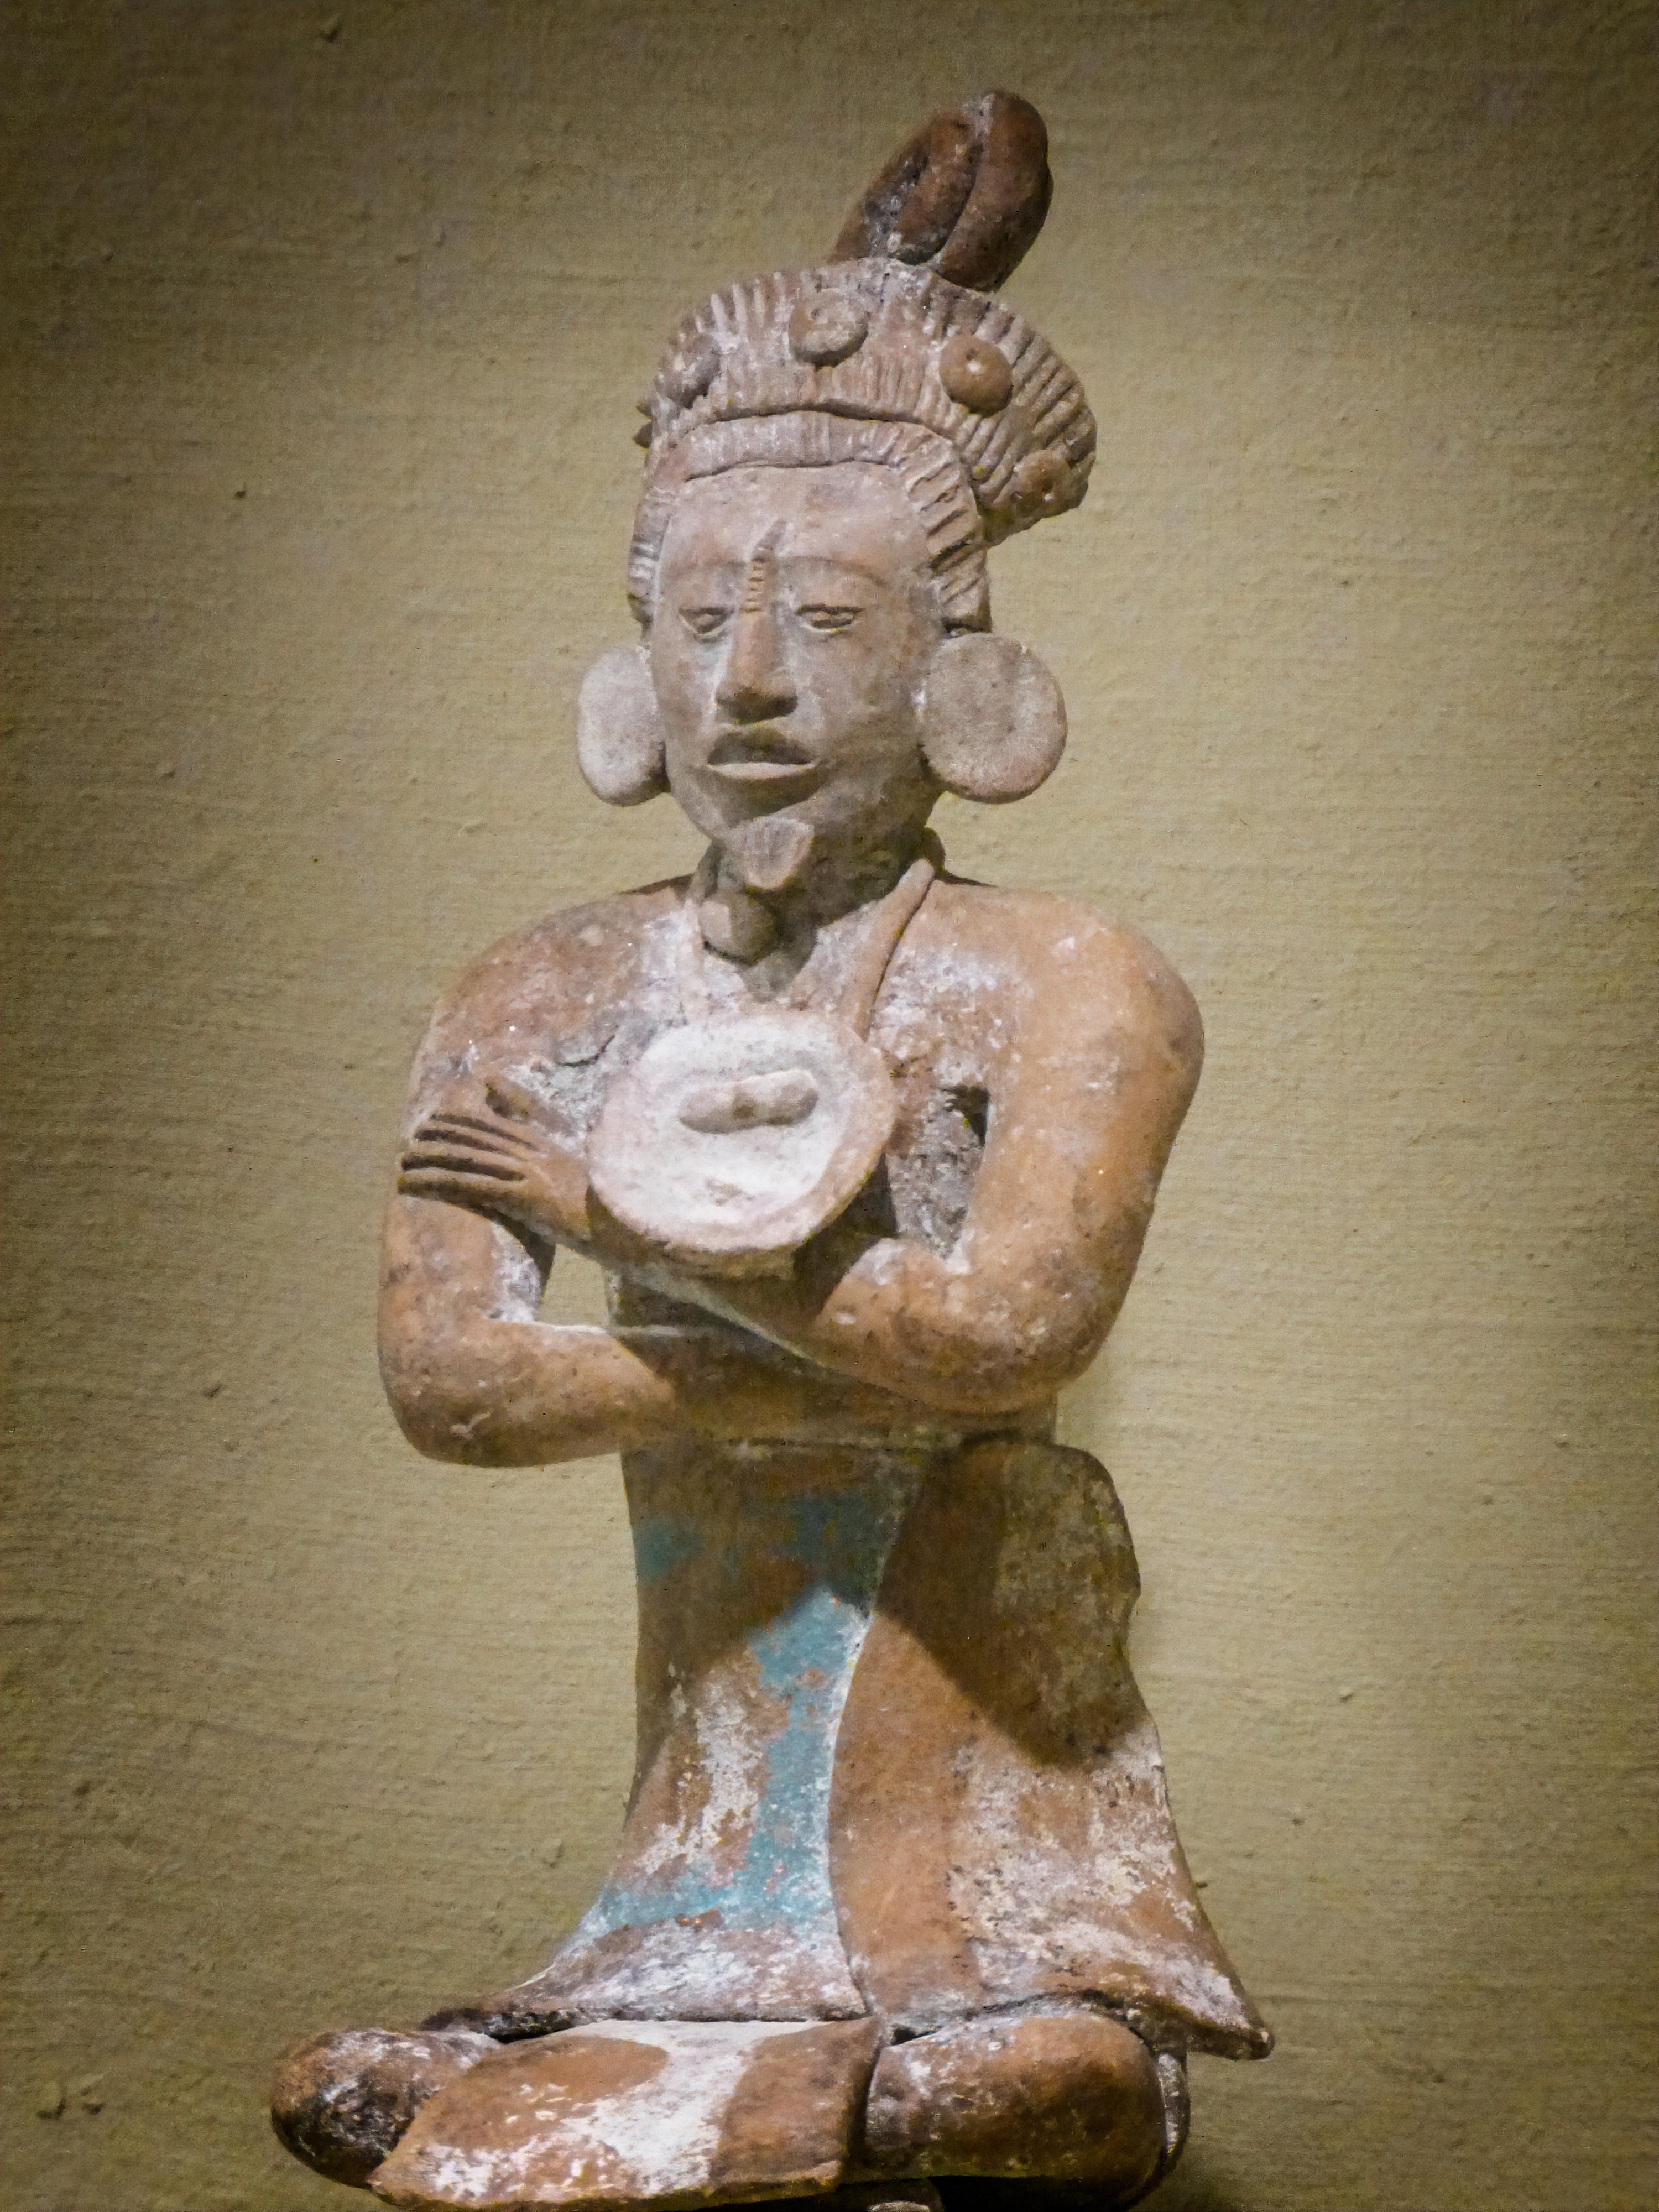 File:Maya seated male figure 600-900 CE at the Portland Art